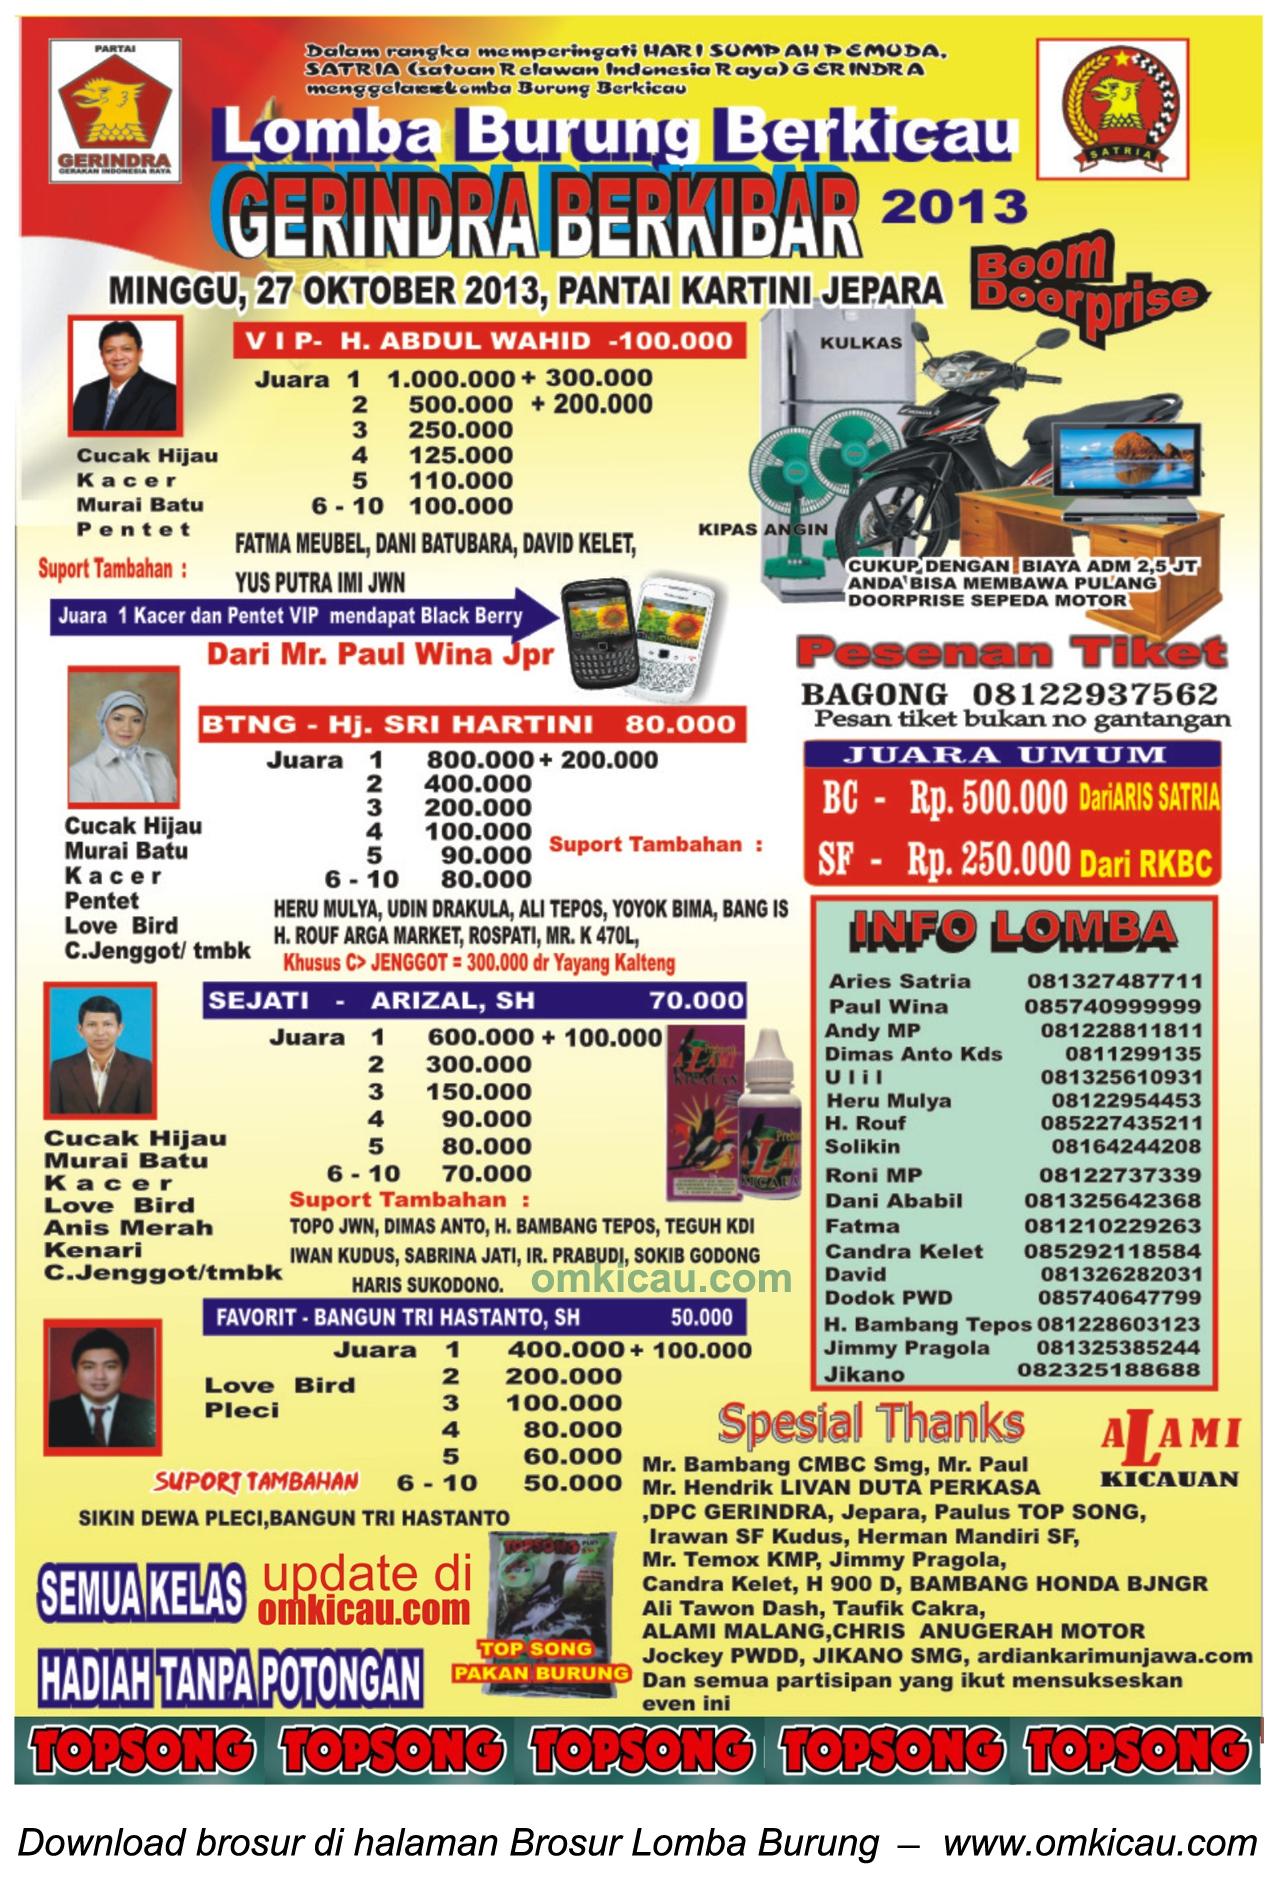 Brosur Lomba Burung Gerindra Berkibar, Jepara, 27 Oktober 2013